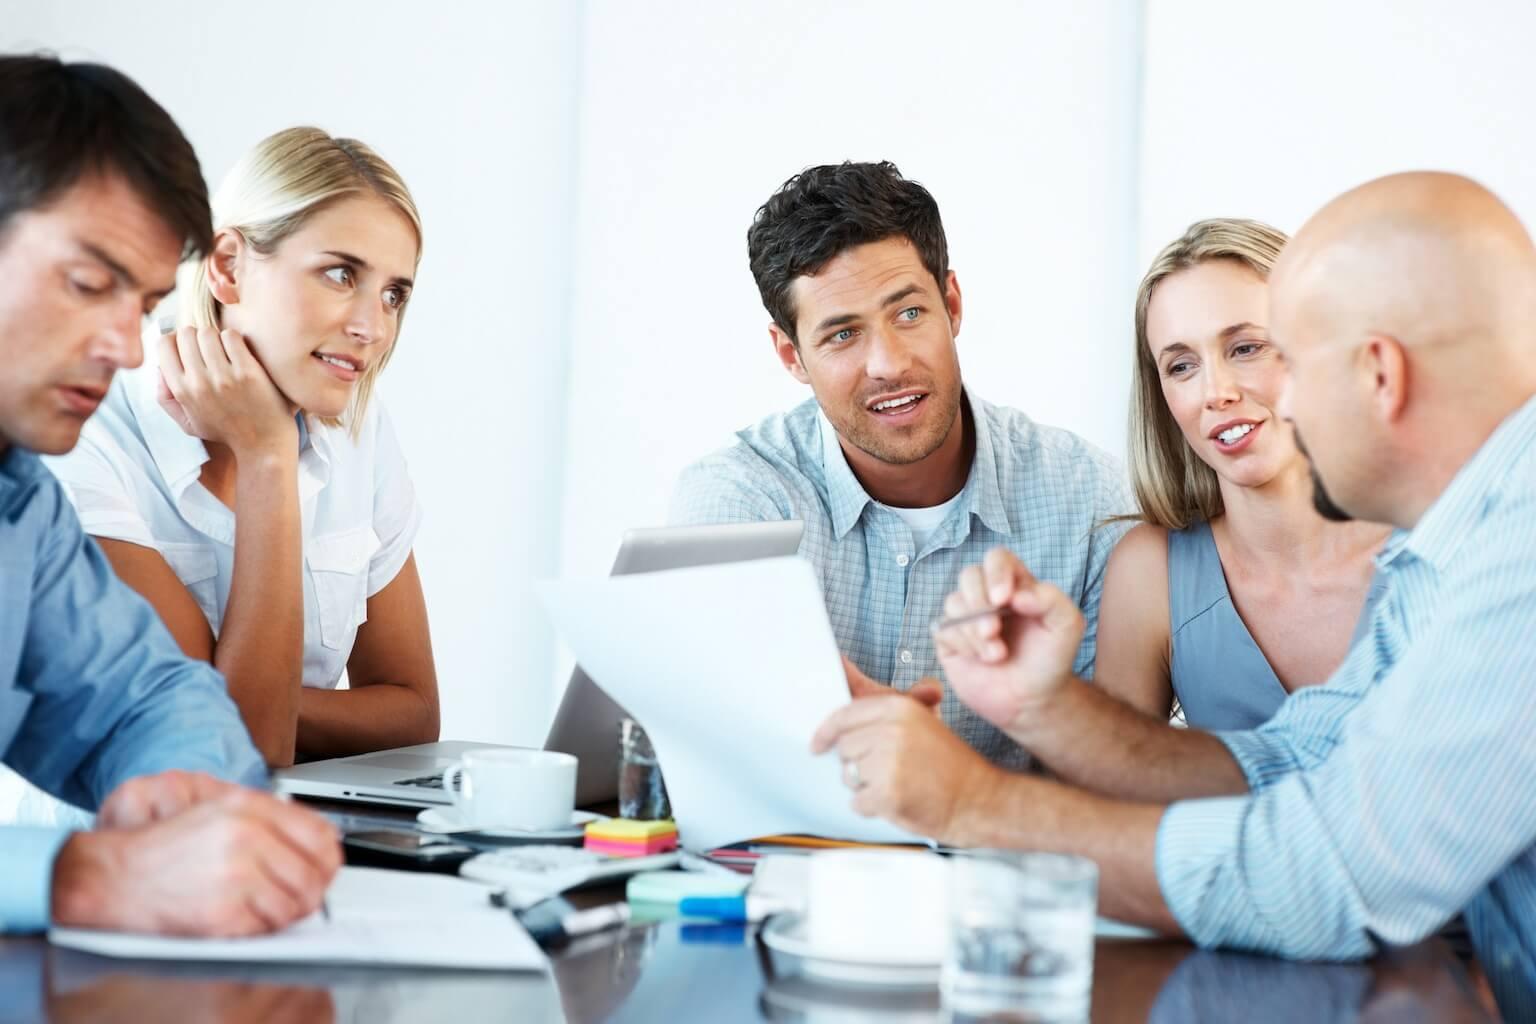 business-meeting-yuri-arcurs.jpg